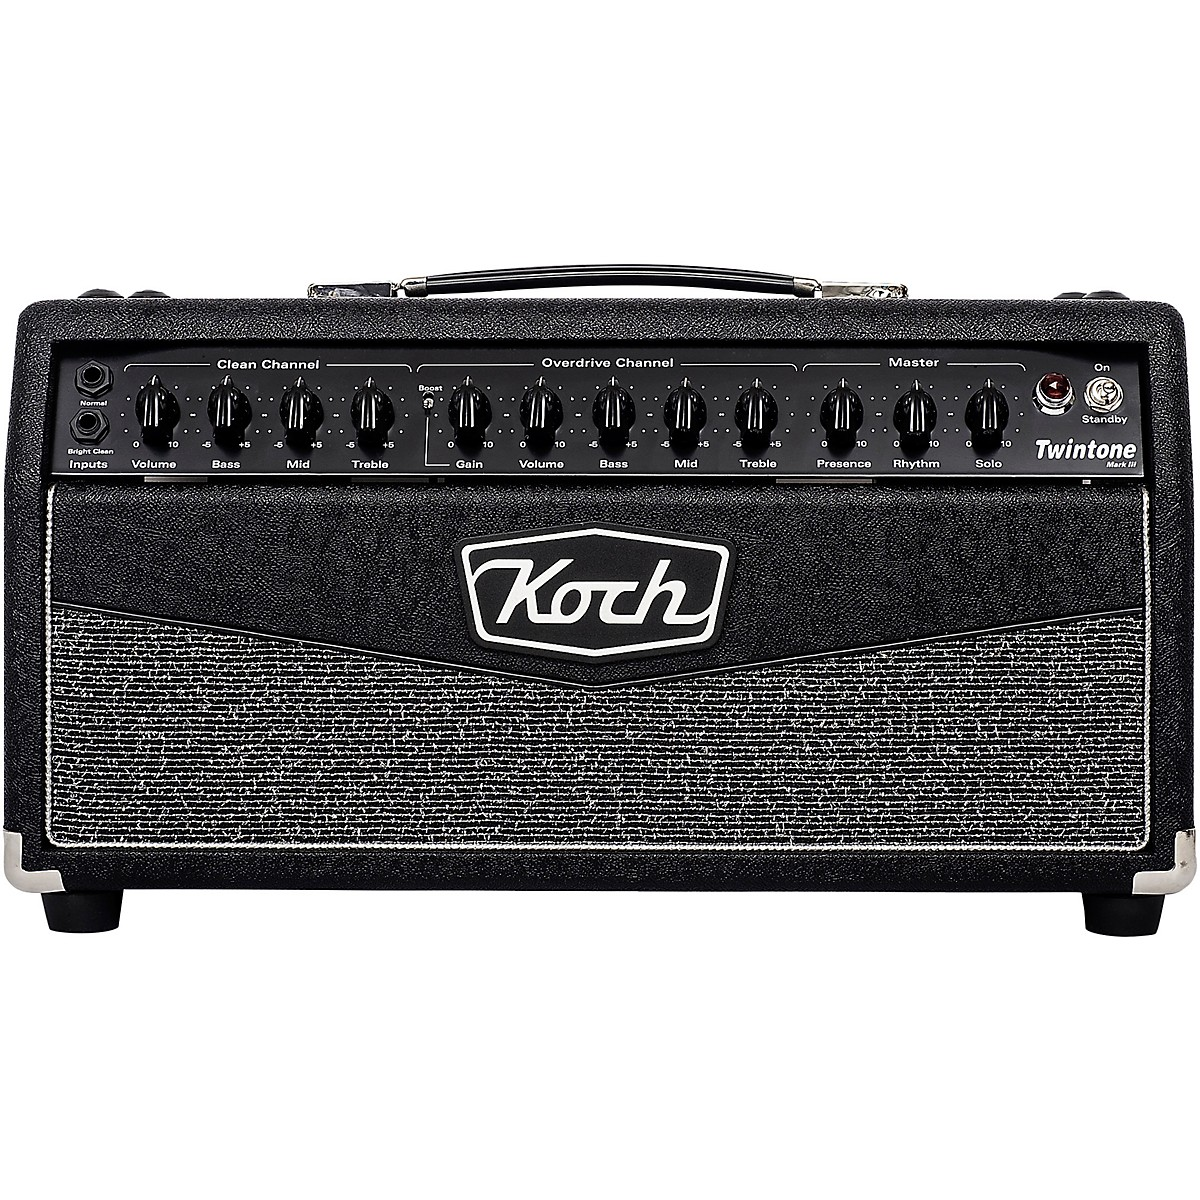 Koch Twintone III 50W Tube Guitar Amp Head